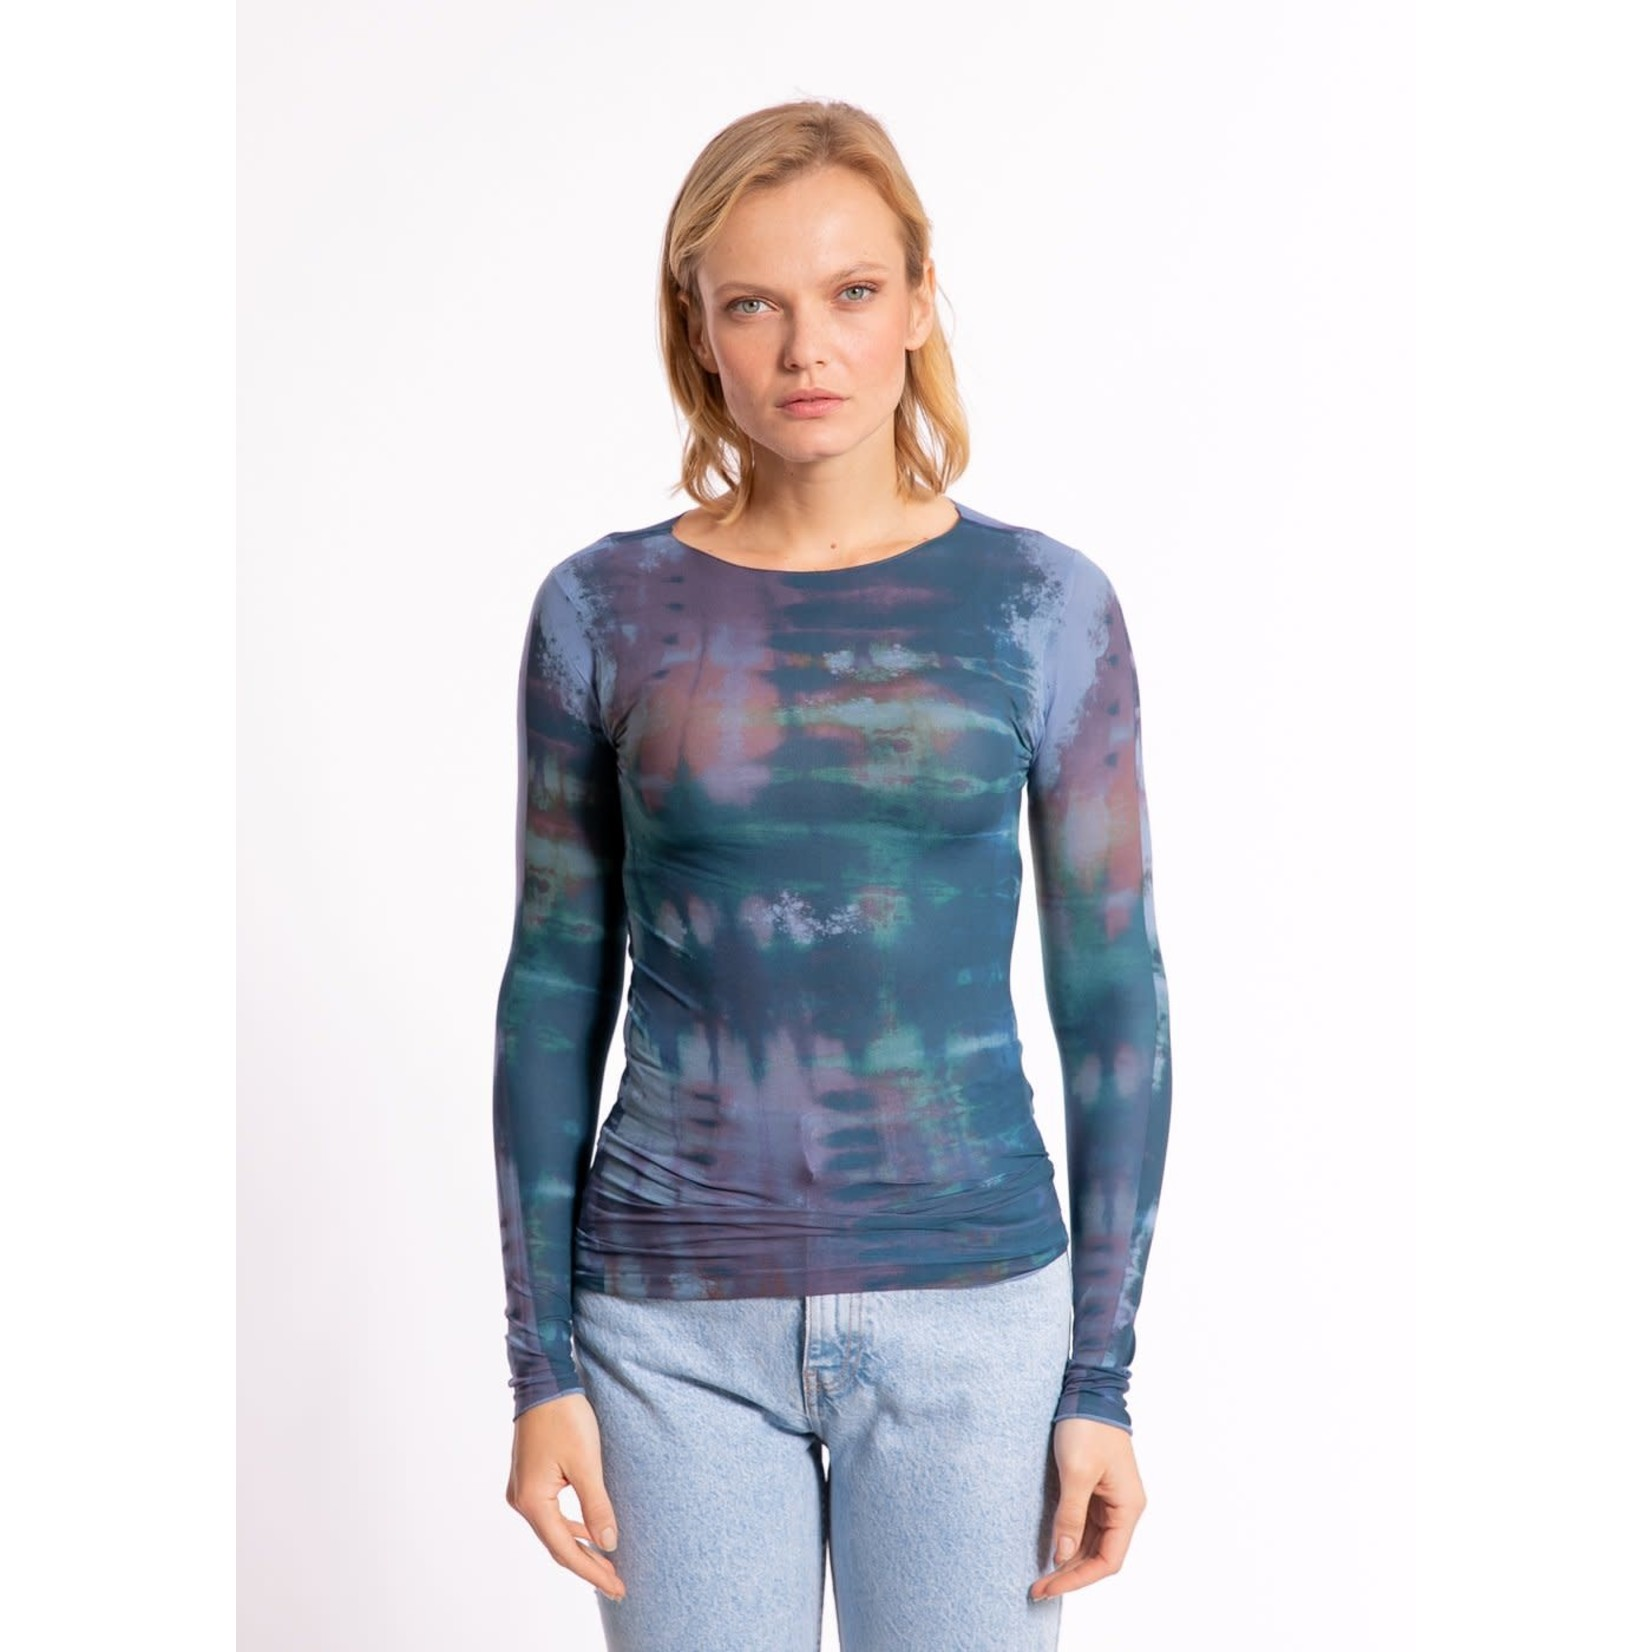 AMB Designs International Gaia Second Skin Raw Edge in Cashmere Blue/OS